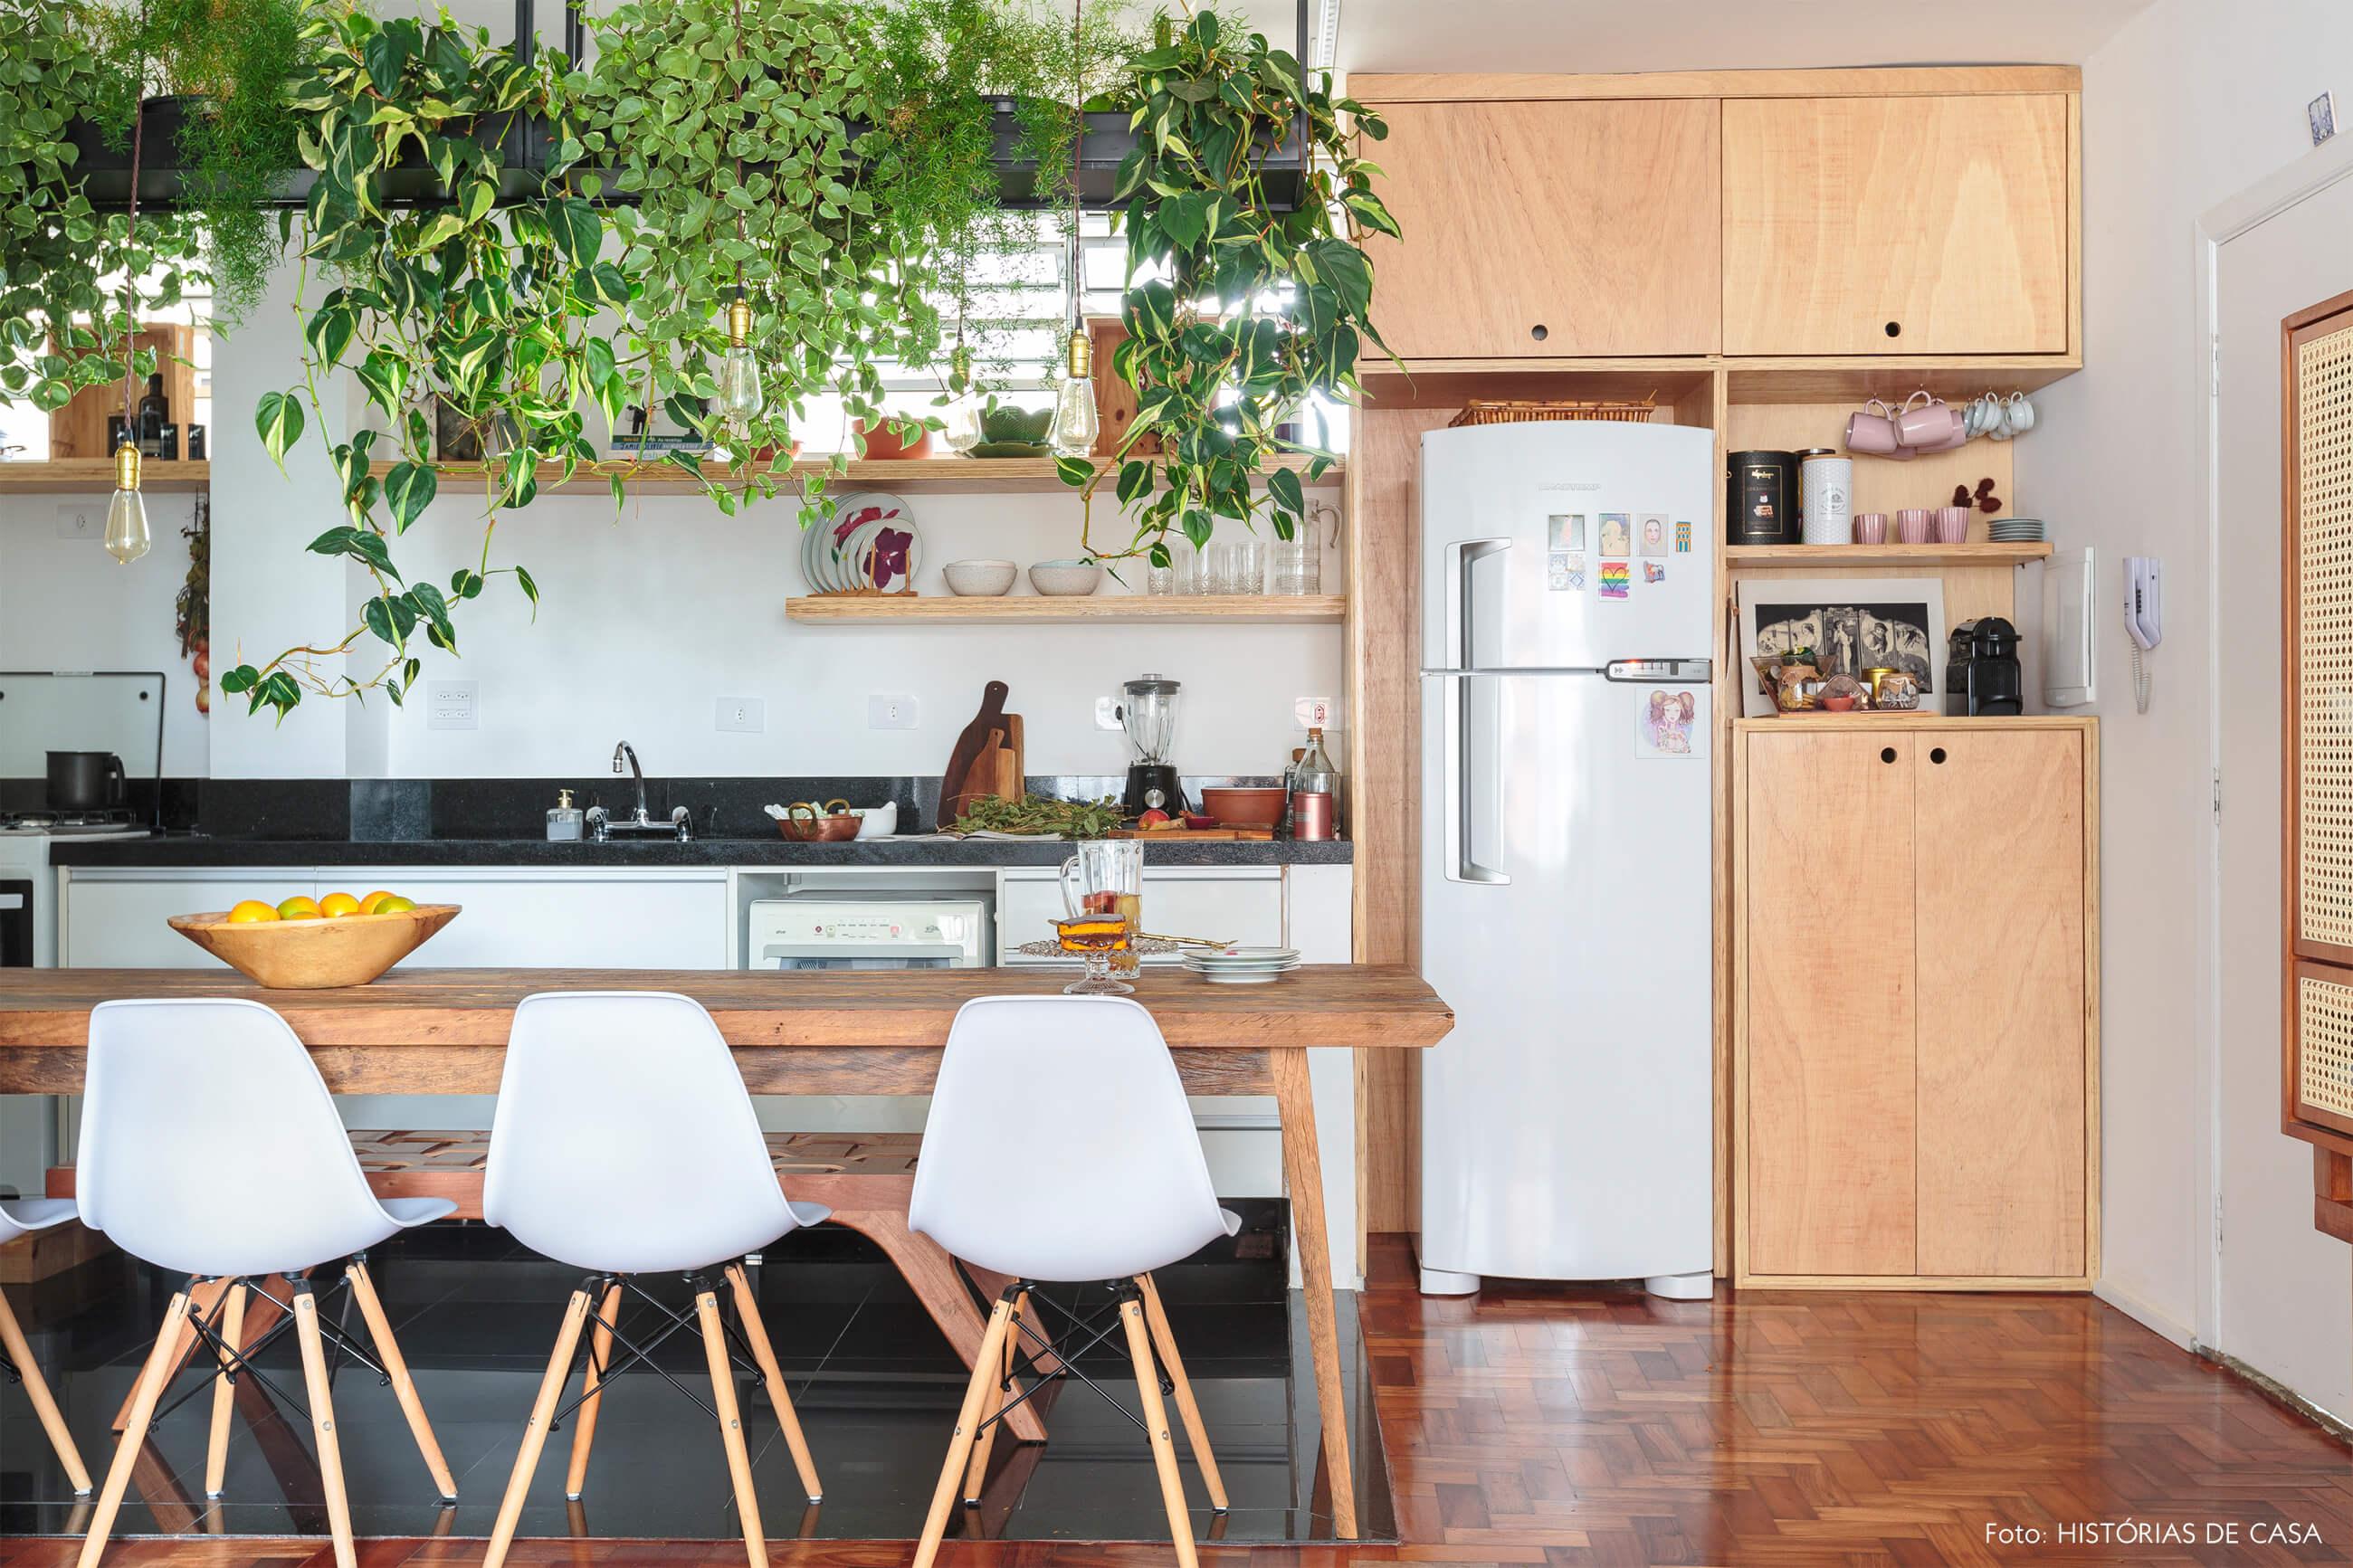 cozinha-cadeira-eames-branca-mesa-madeira-piso-taco-madeira-plantas-teto